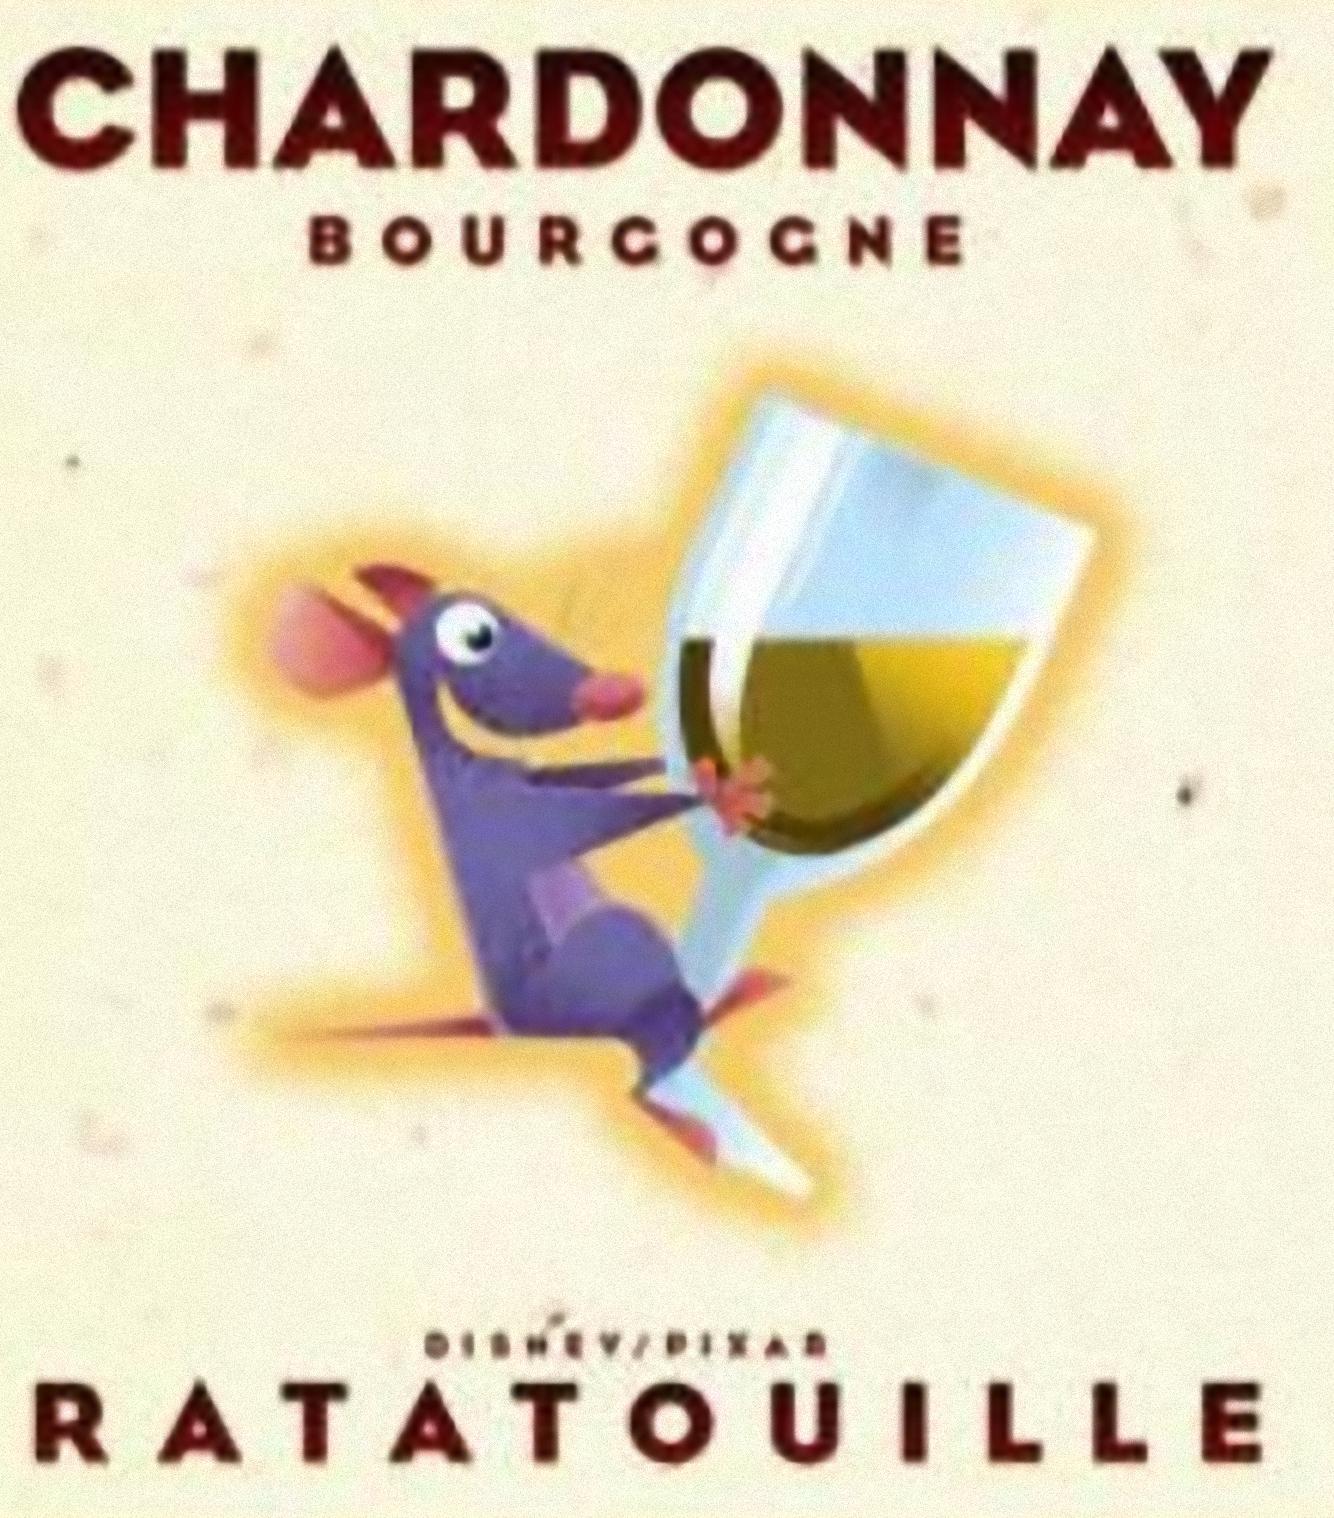 """2004 Ratatouille Chardonnay"""